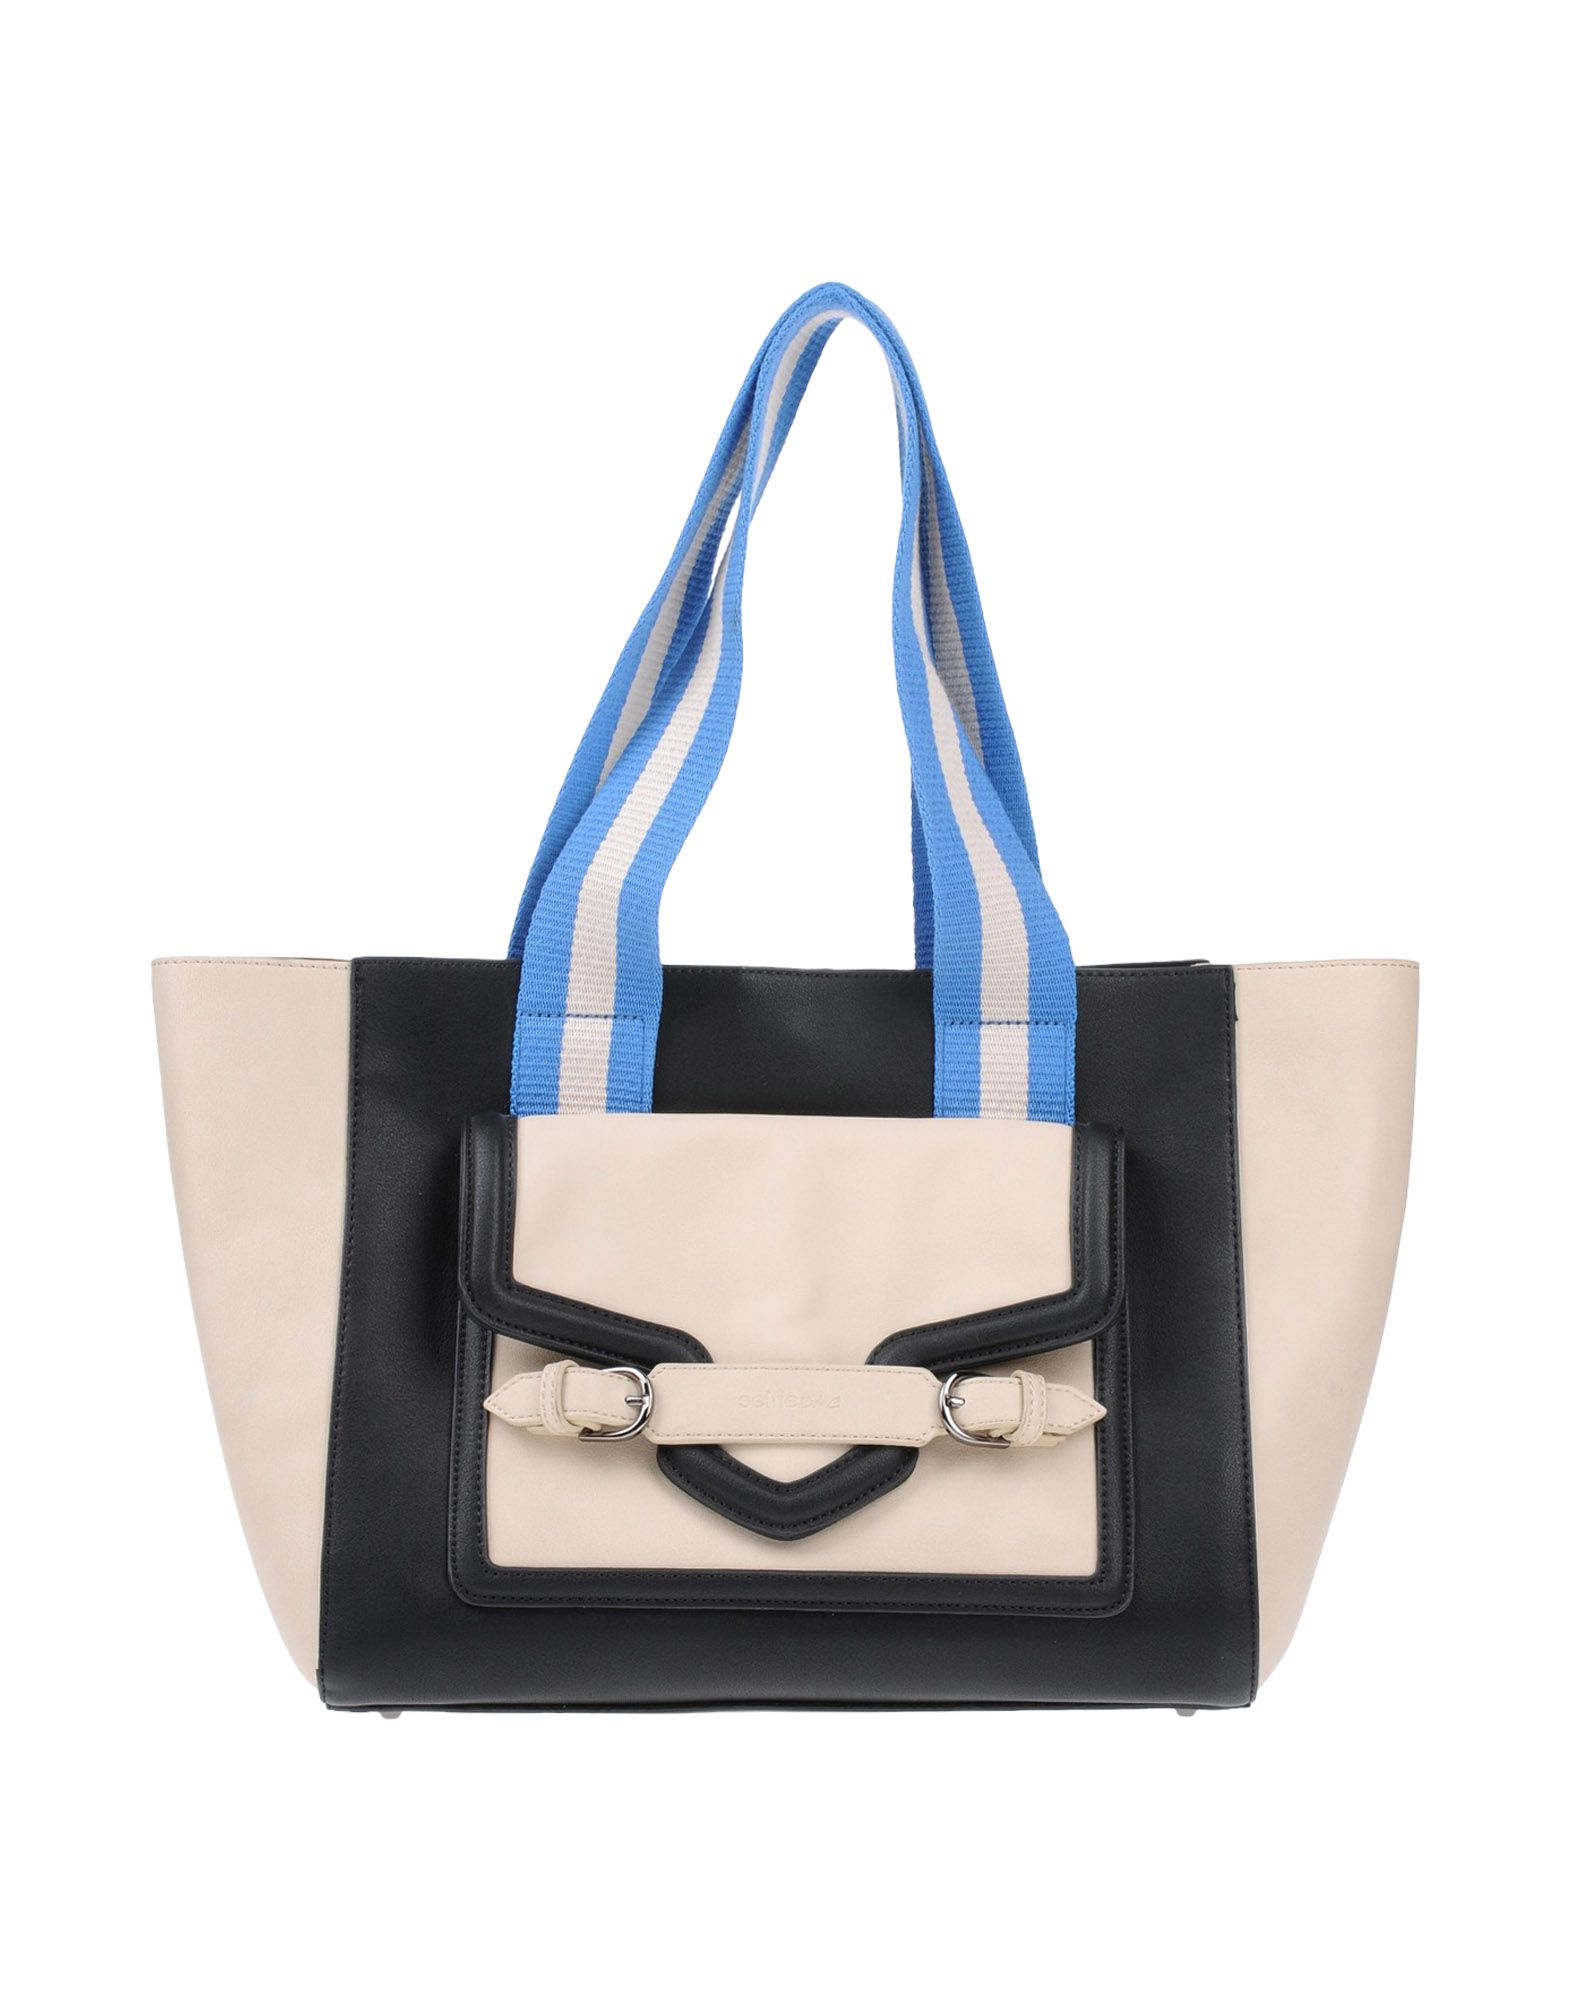 SELFIE BAG Сумка на руку makeup organizer travel bag women cosmetic bags summer dumpling clutch women packages waterproof cosmetic bag handbag